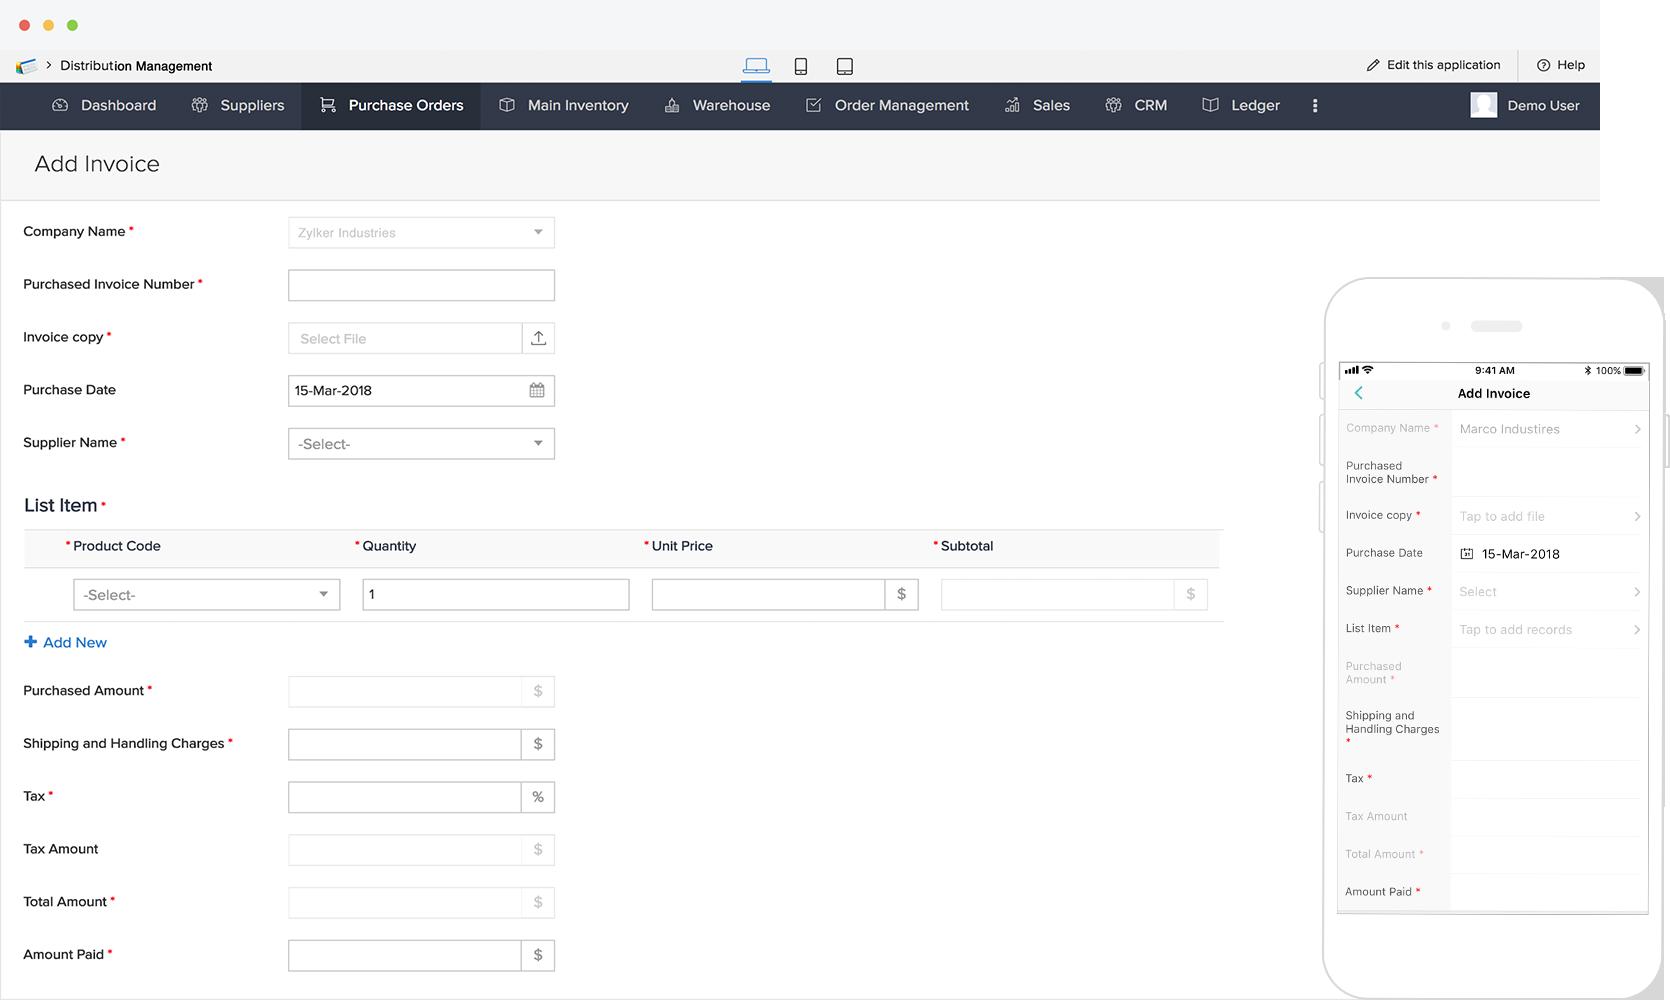 Free distribution management software | Customizable distribution